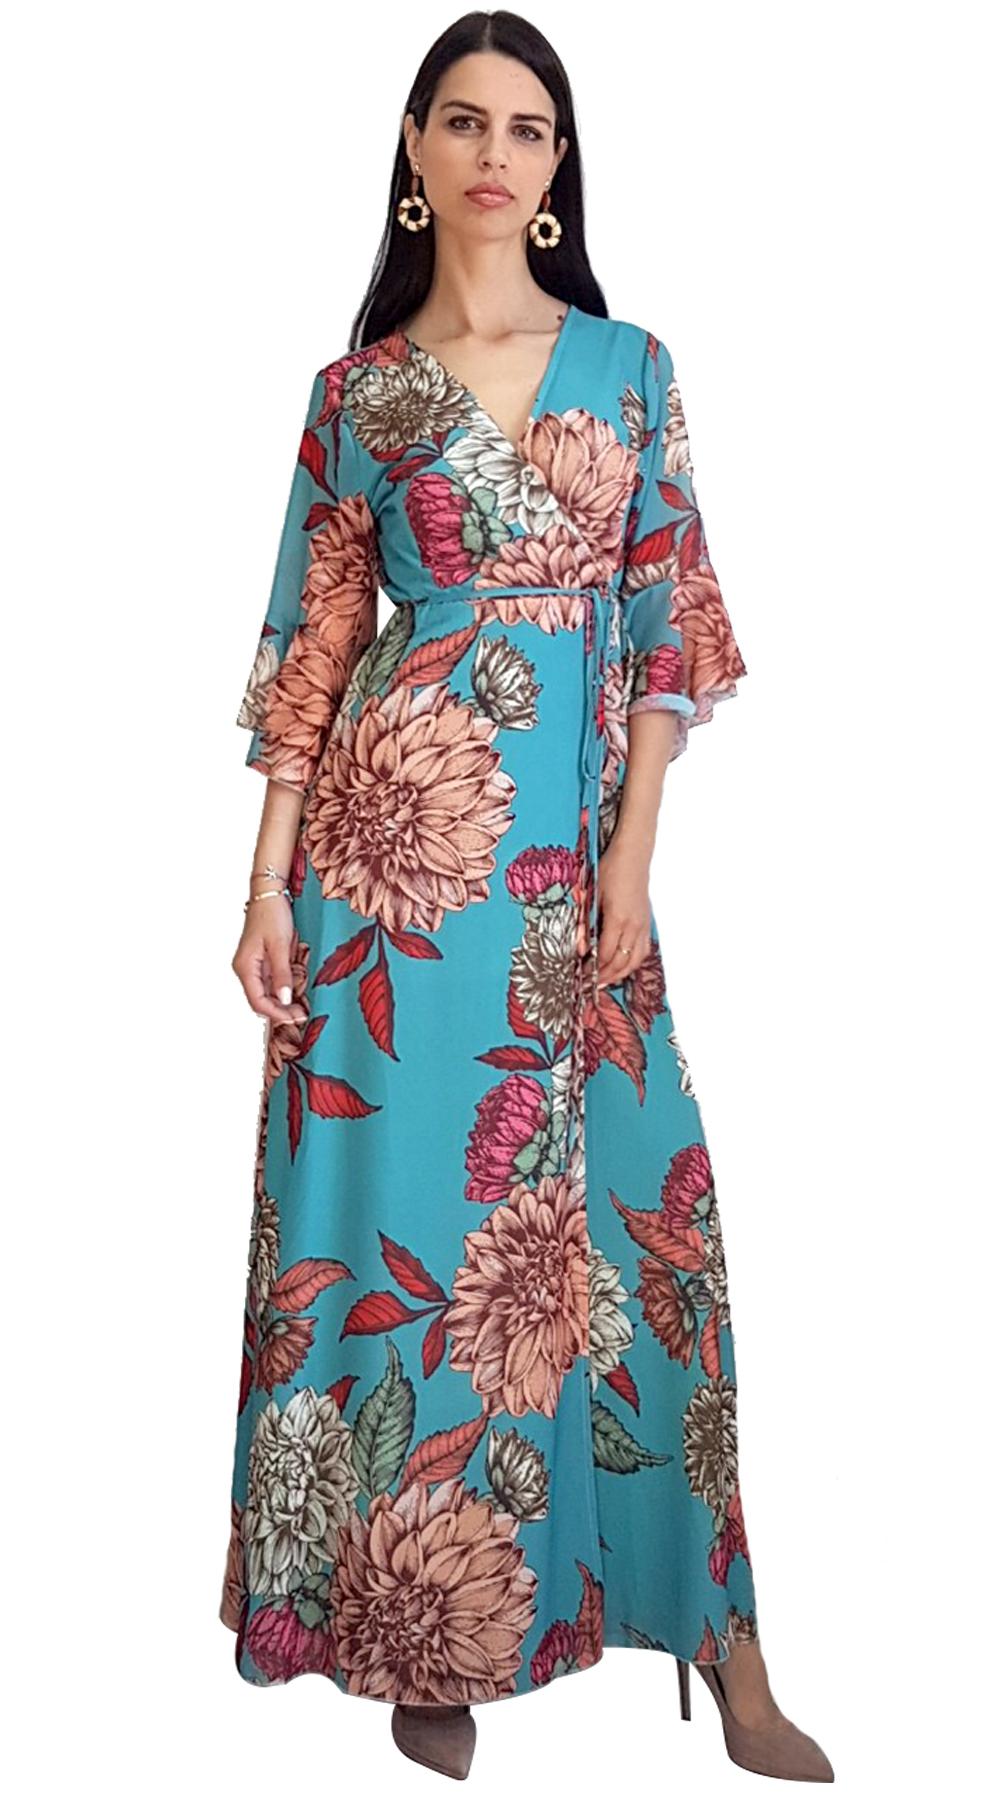 Floral Maxi Φόρεμα - MissReina - SP19AG-58559 φορέματα so girly